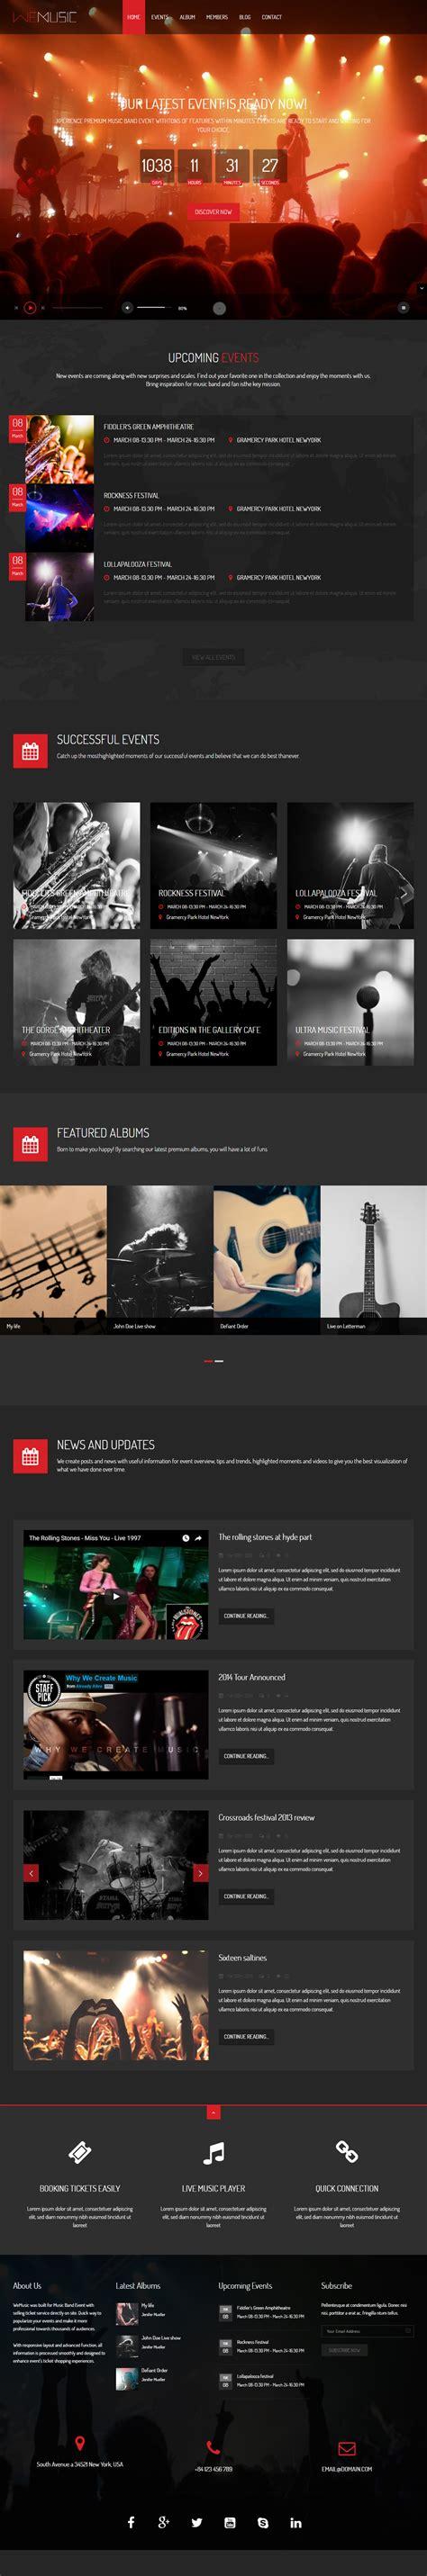 theme drupal music 5 best responsive drupal events theme 2017 responsive